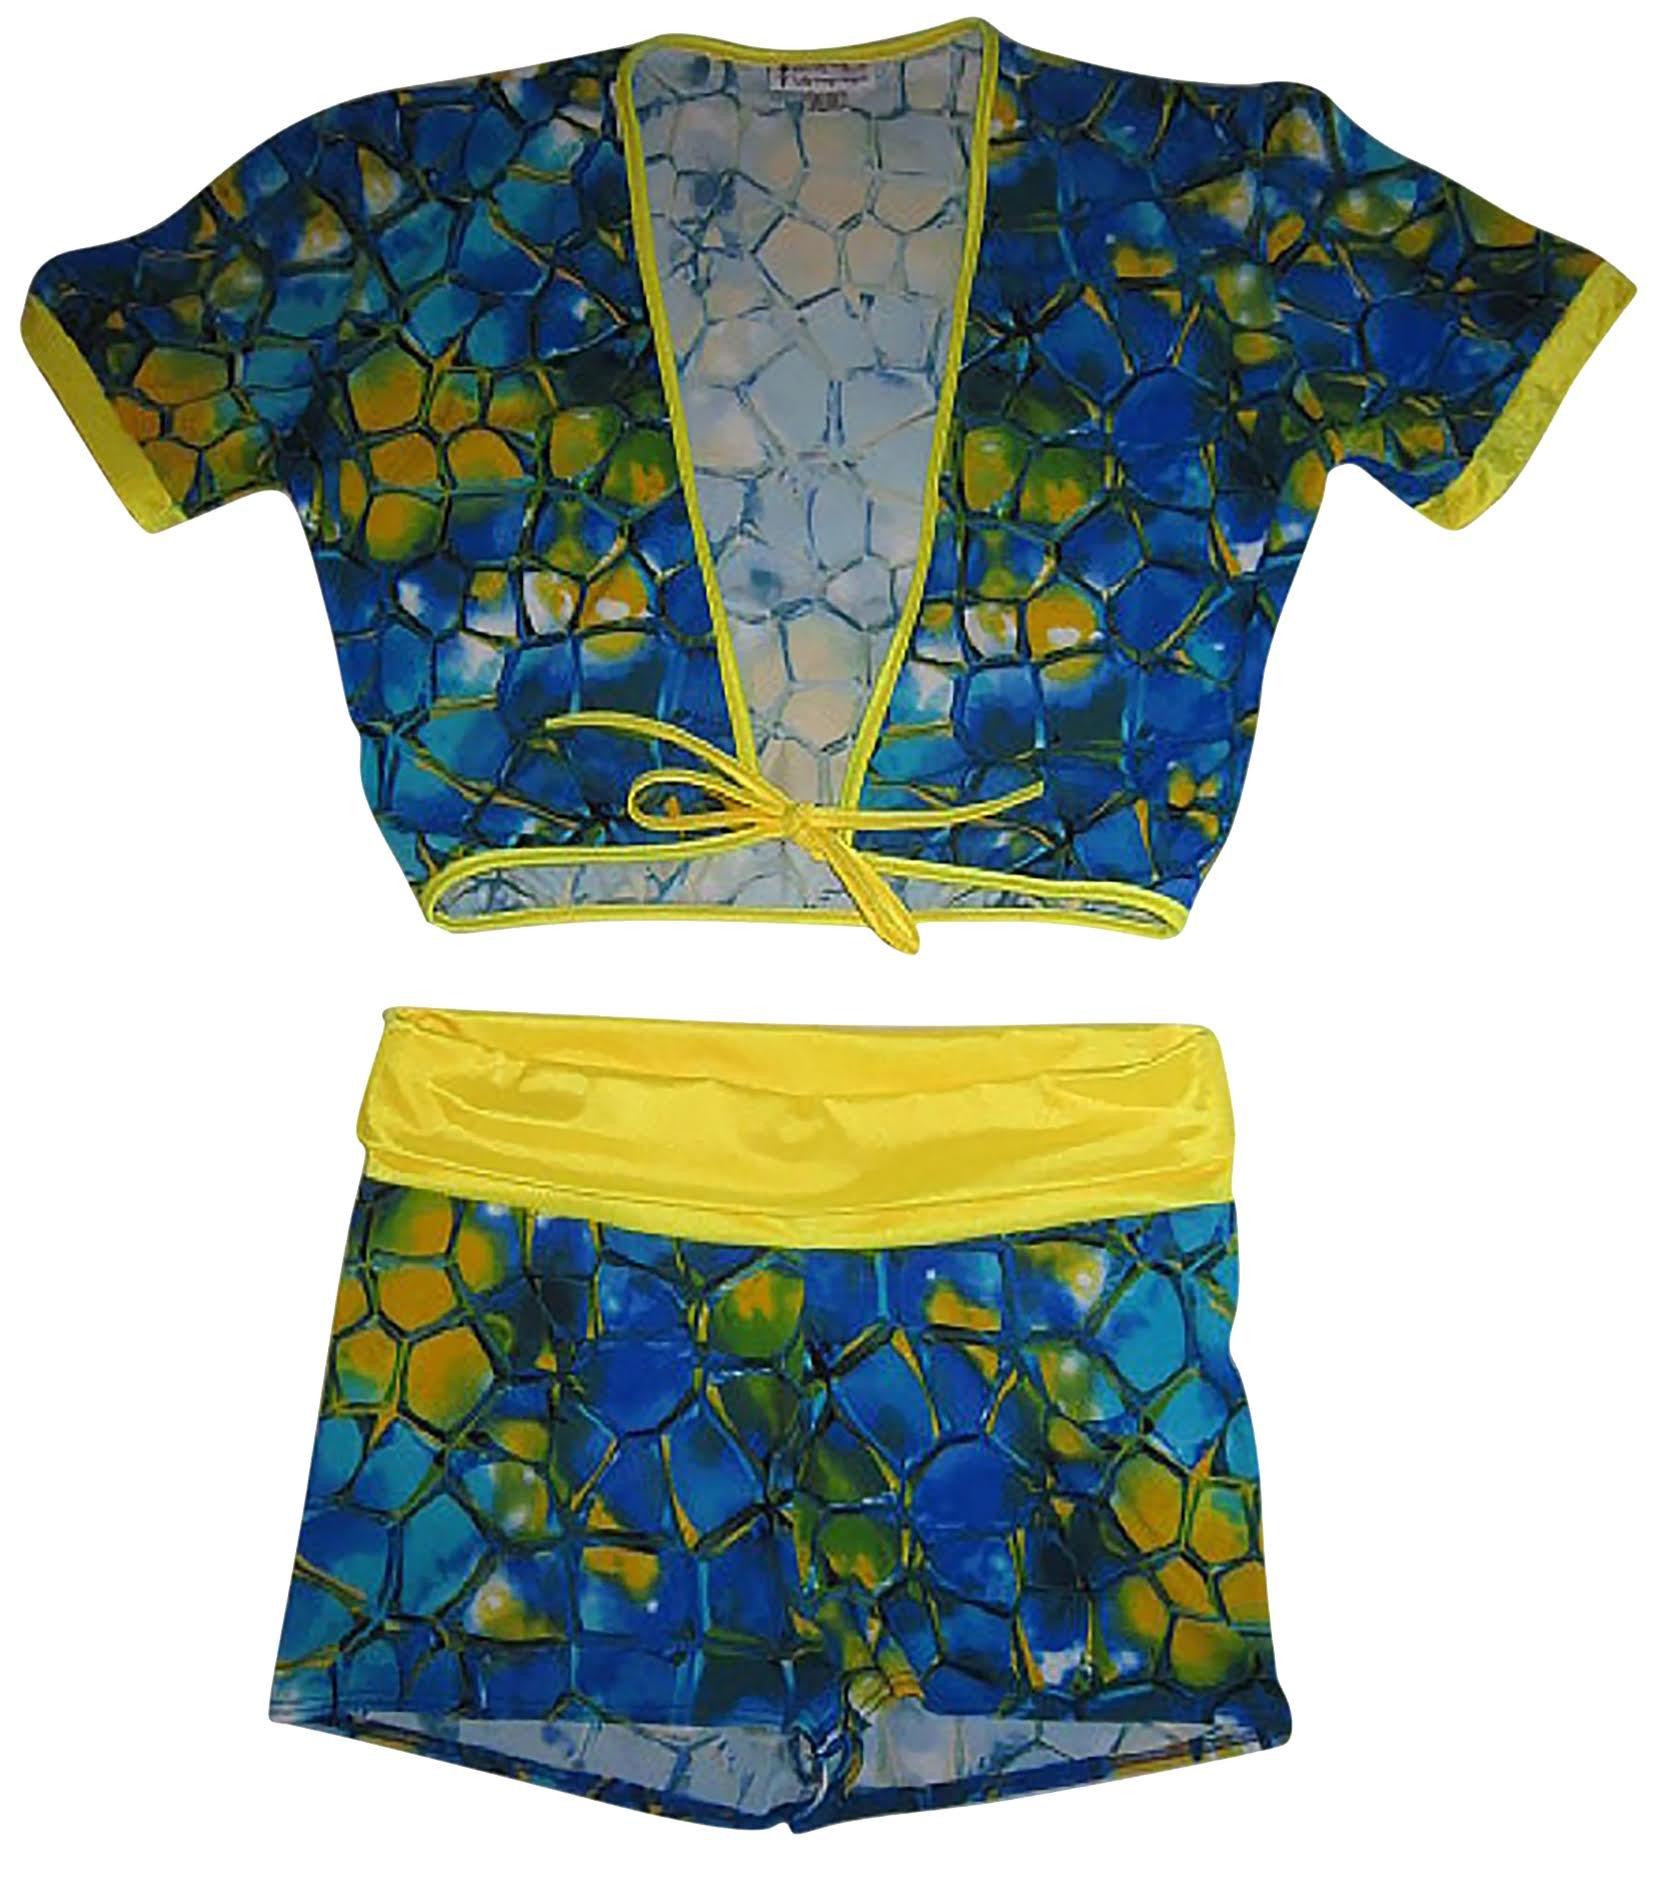 Plus Size Roll over waist short w Tie front Crop Top (12X, Blue Tortoise)